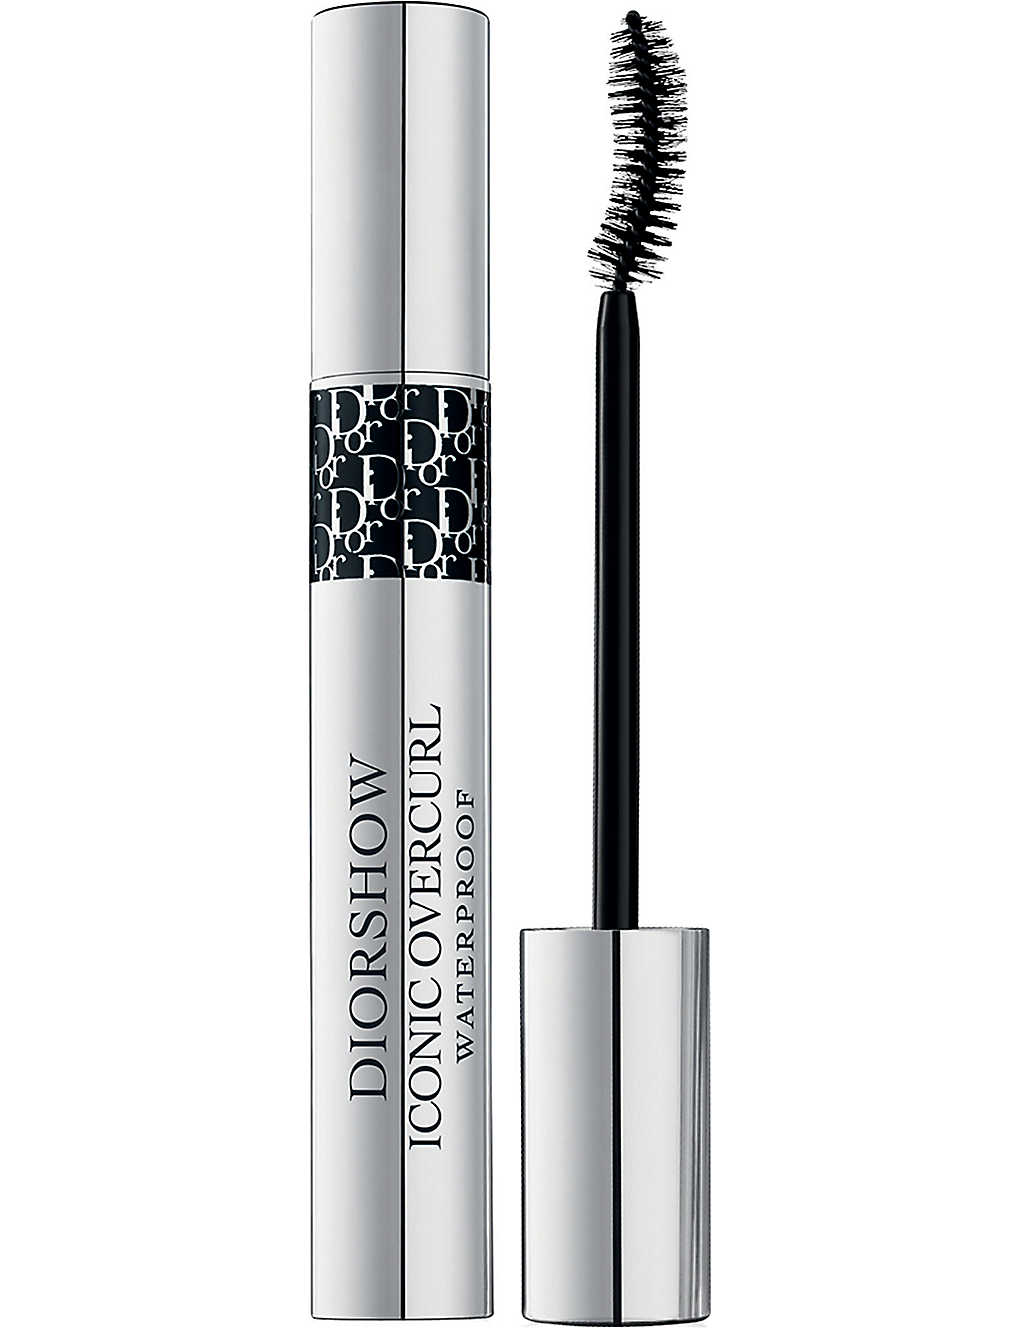 a9a177594fa DIOR - Diorshow Iconic Overcurl waterproof mascara | Selfridges.com